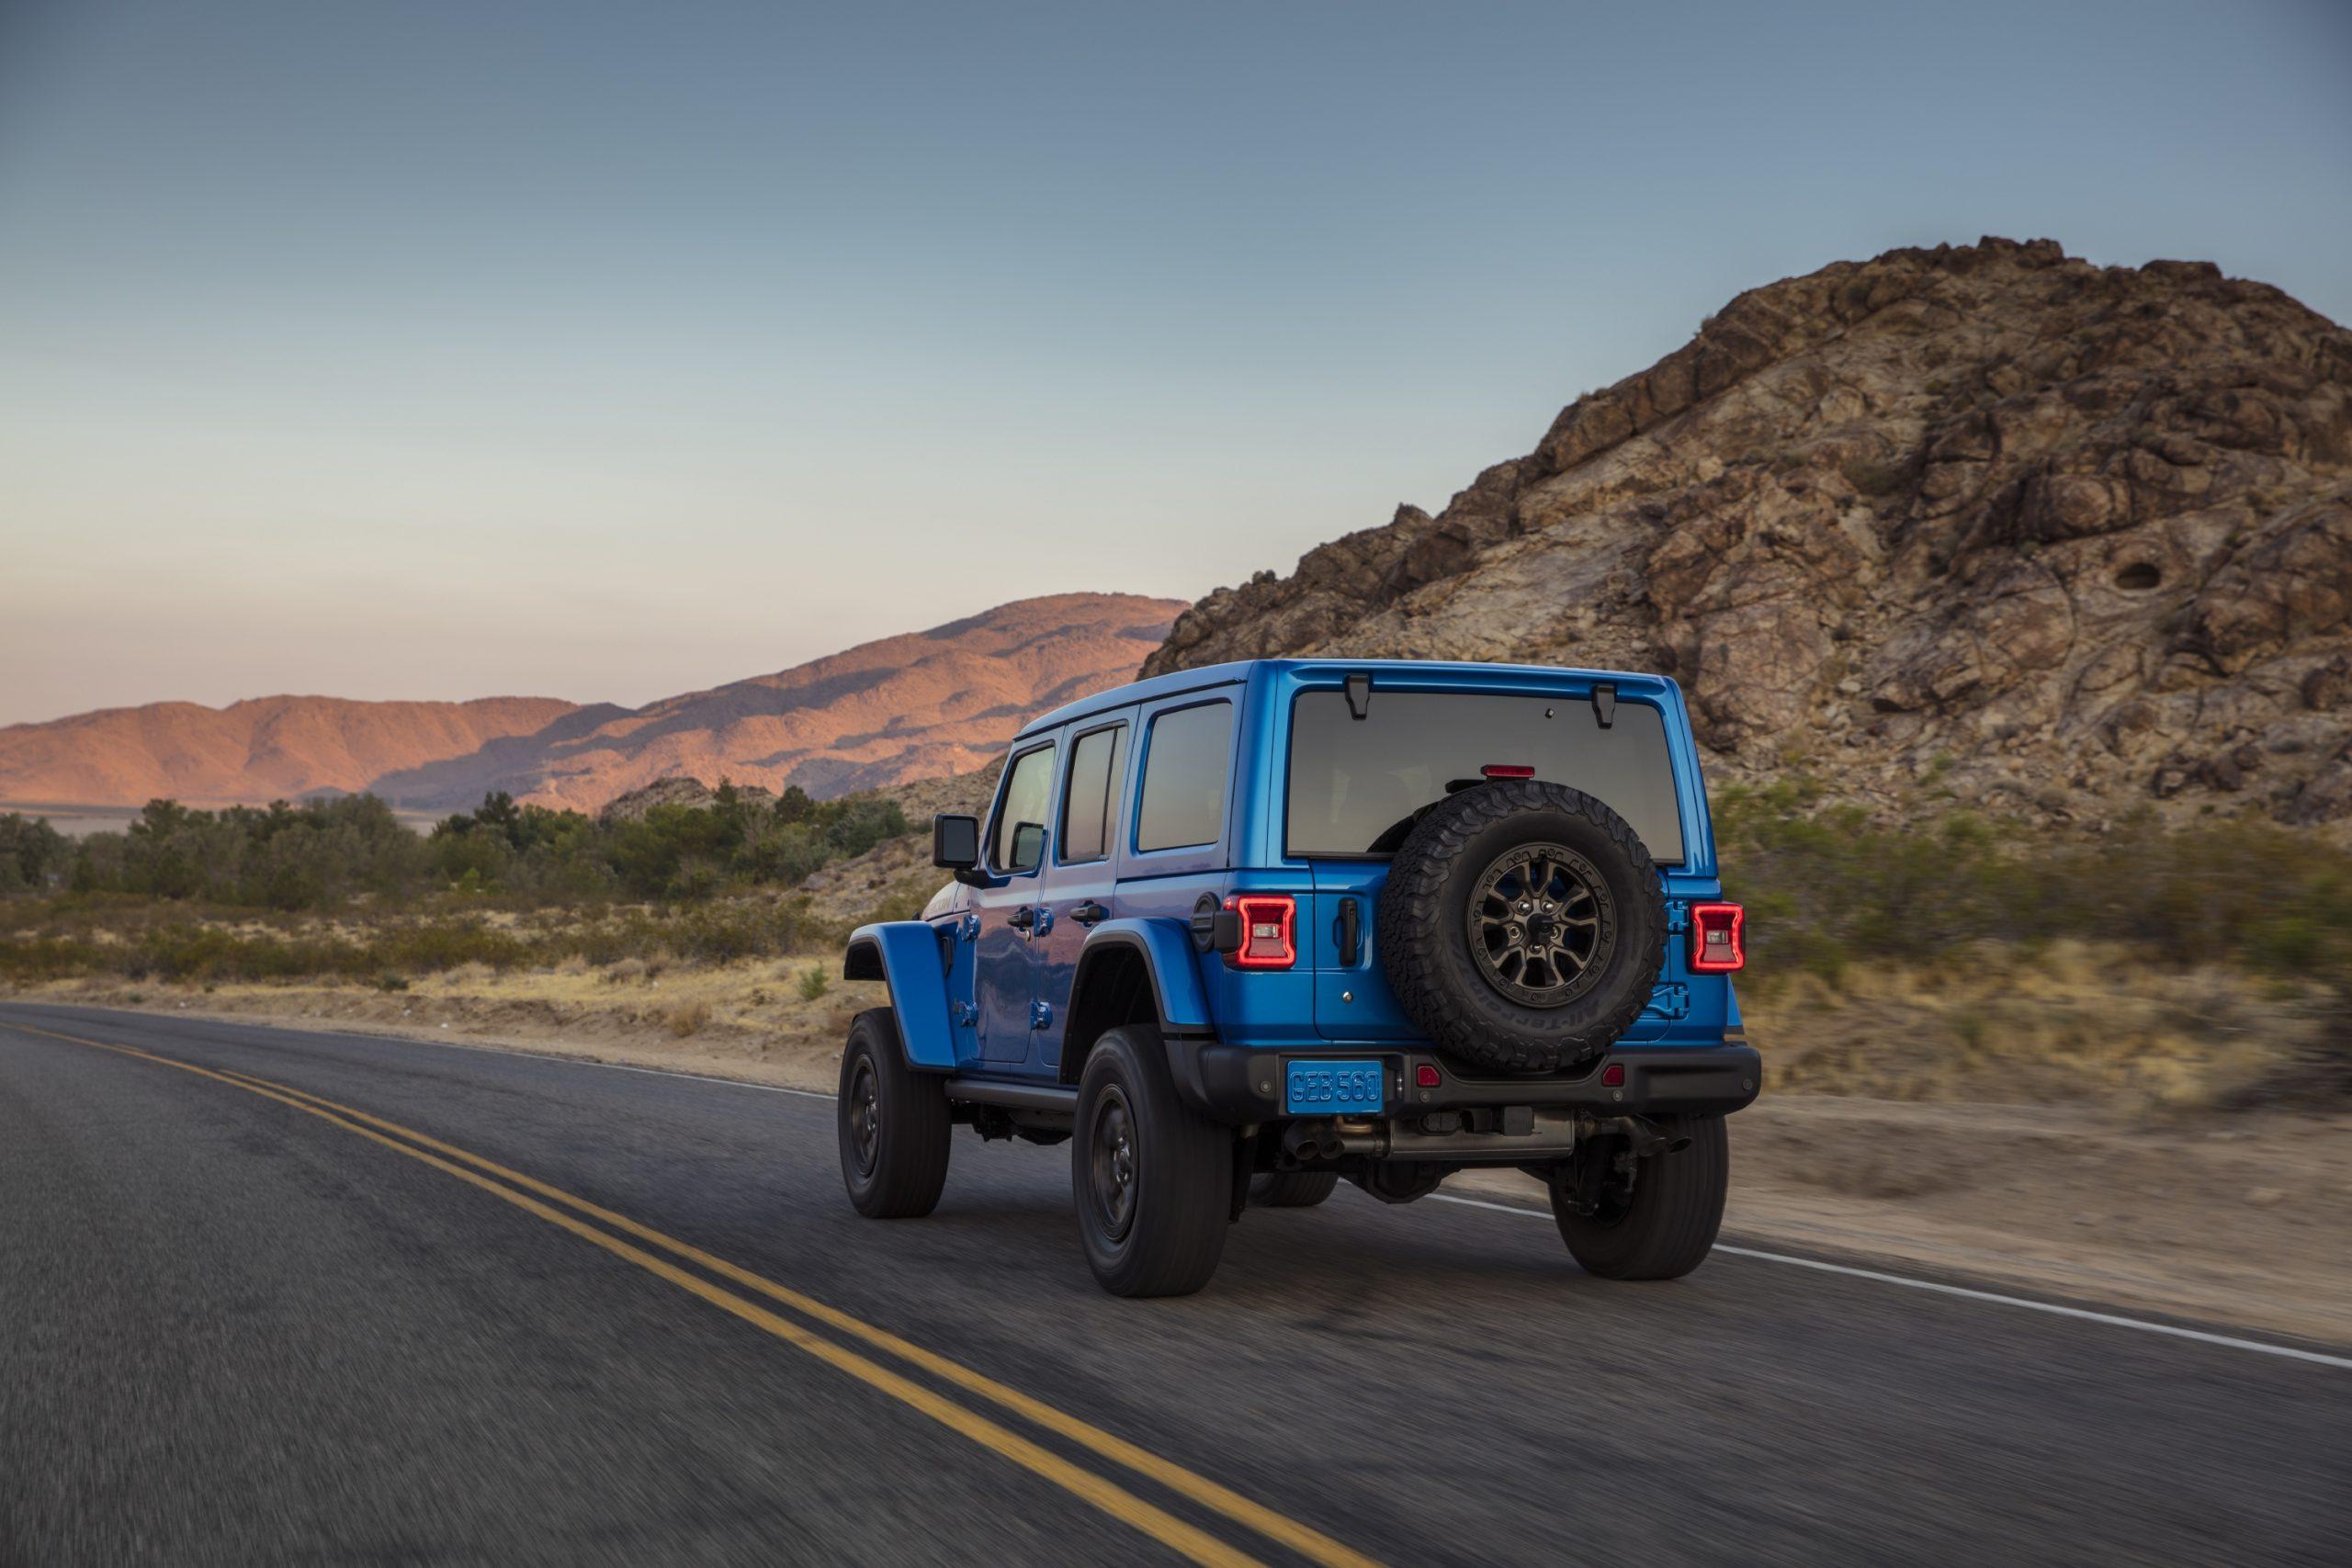 2021 Jeep Wrangler Rubicon 392 blue rear three quarter